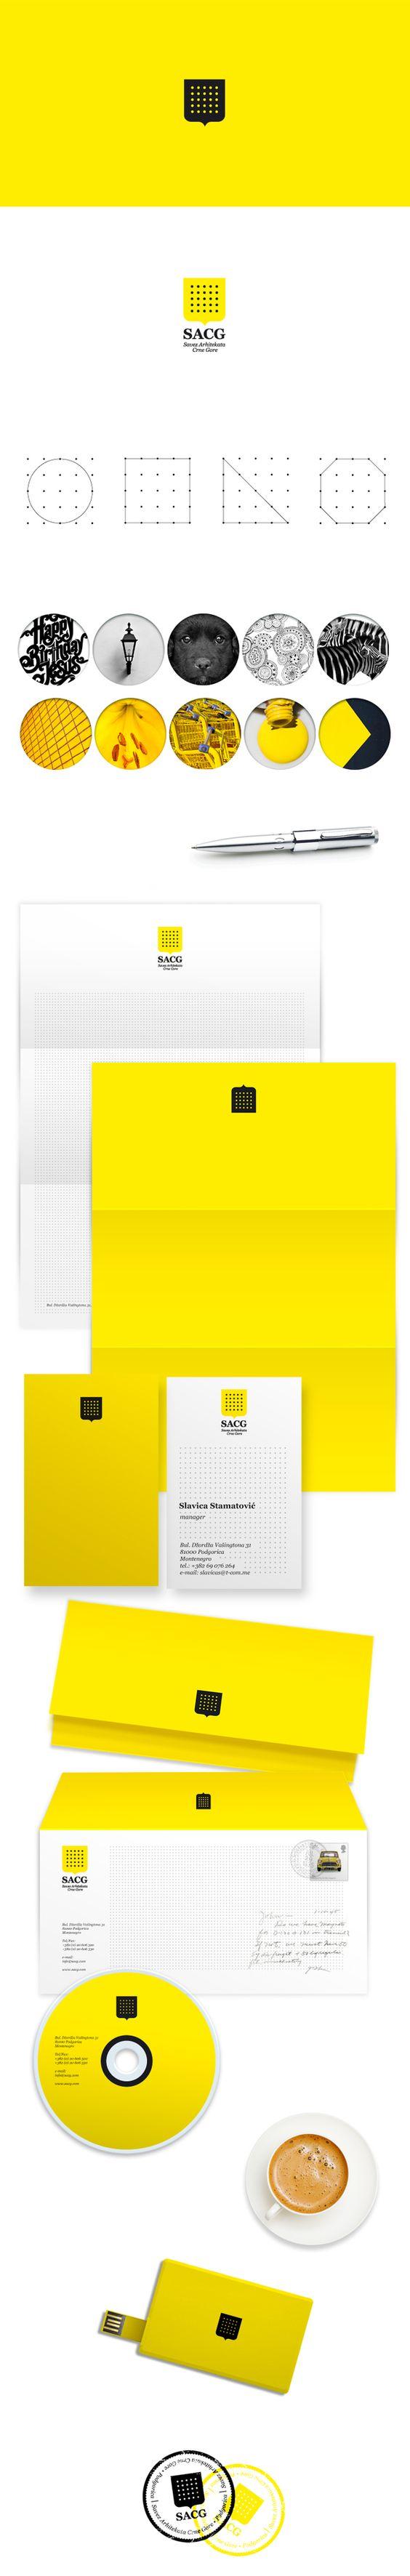 Corporate identity design: